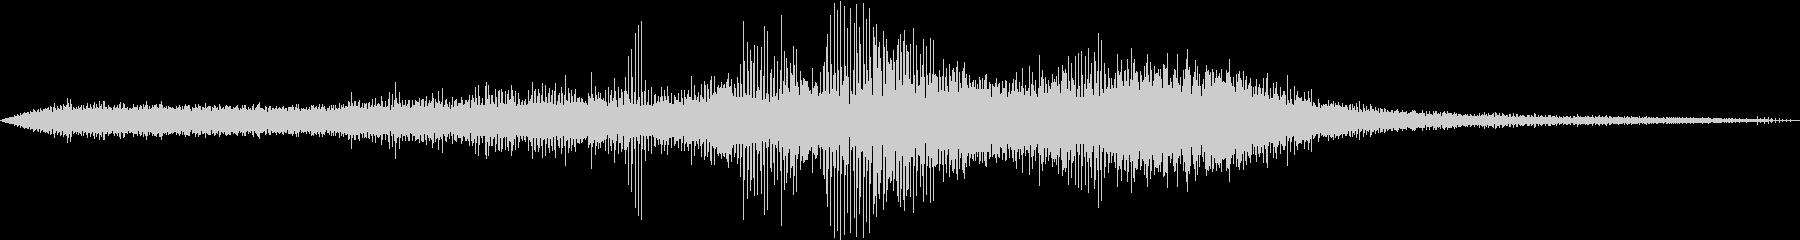 LABRADOR SEARCH a...の未再生の波形